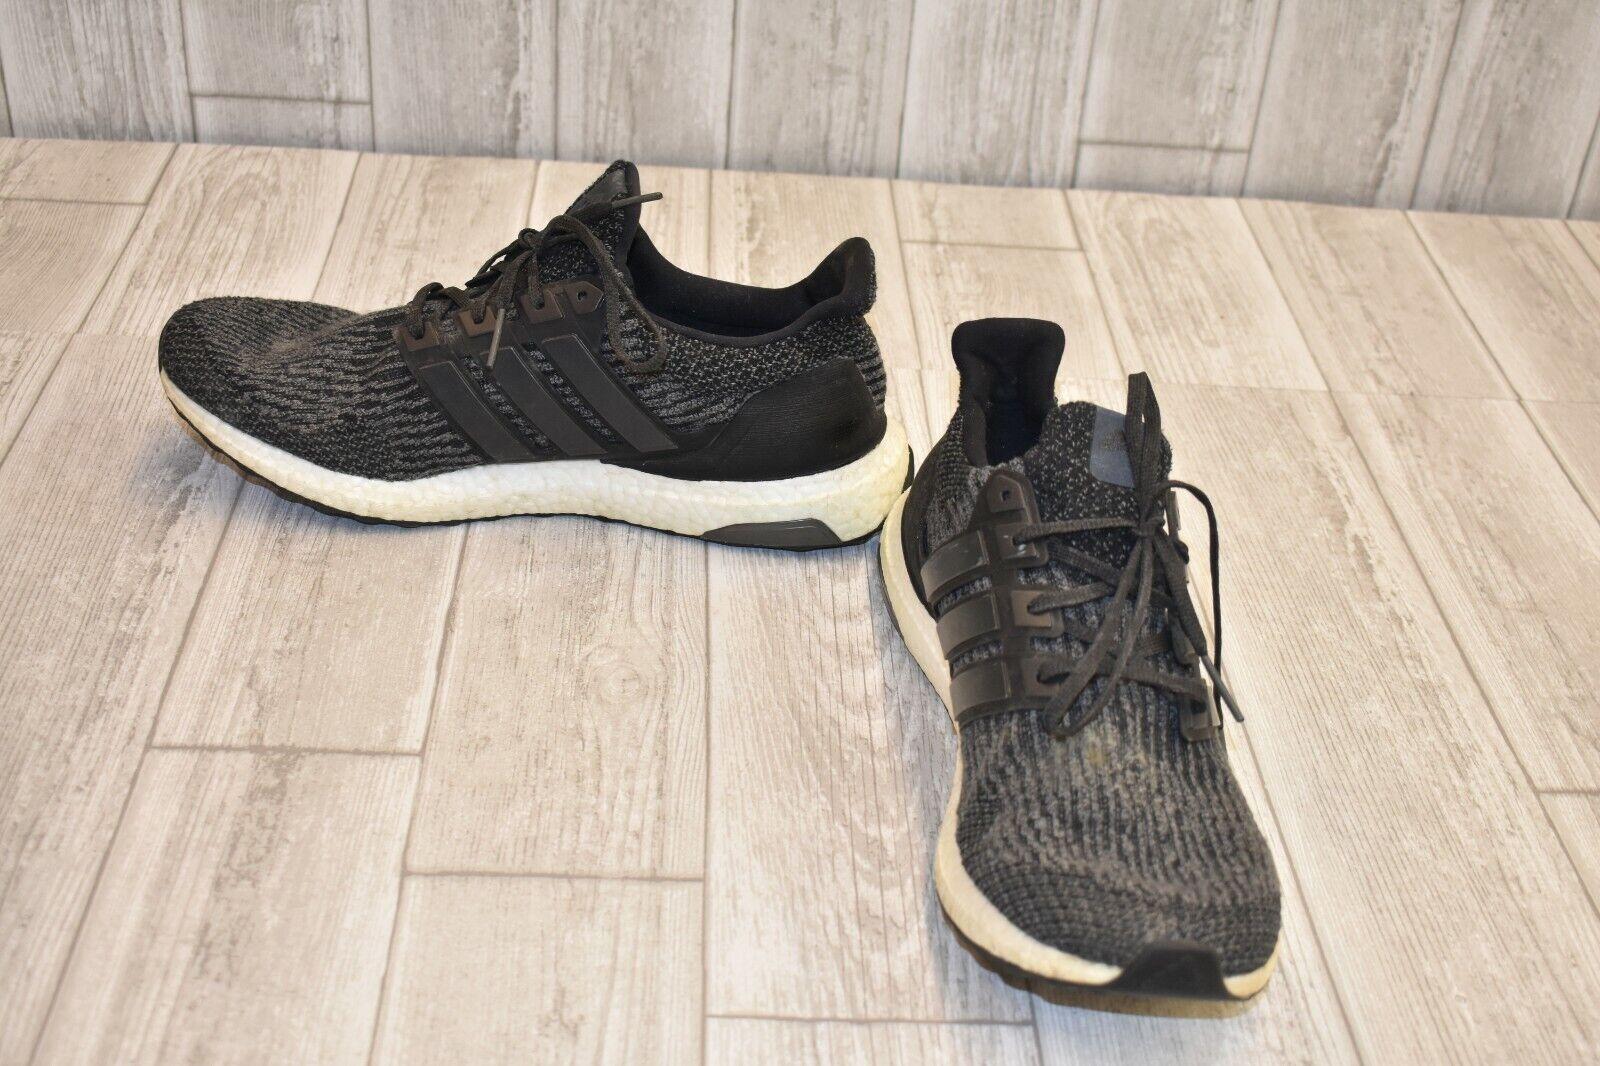 adidas Men's Ultraboost Running Shoes Sz 11 Black White Primeknit S80731